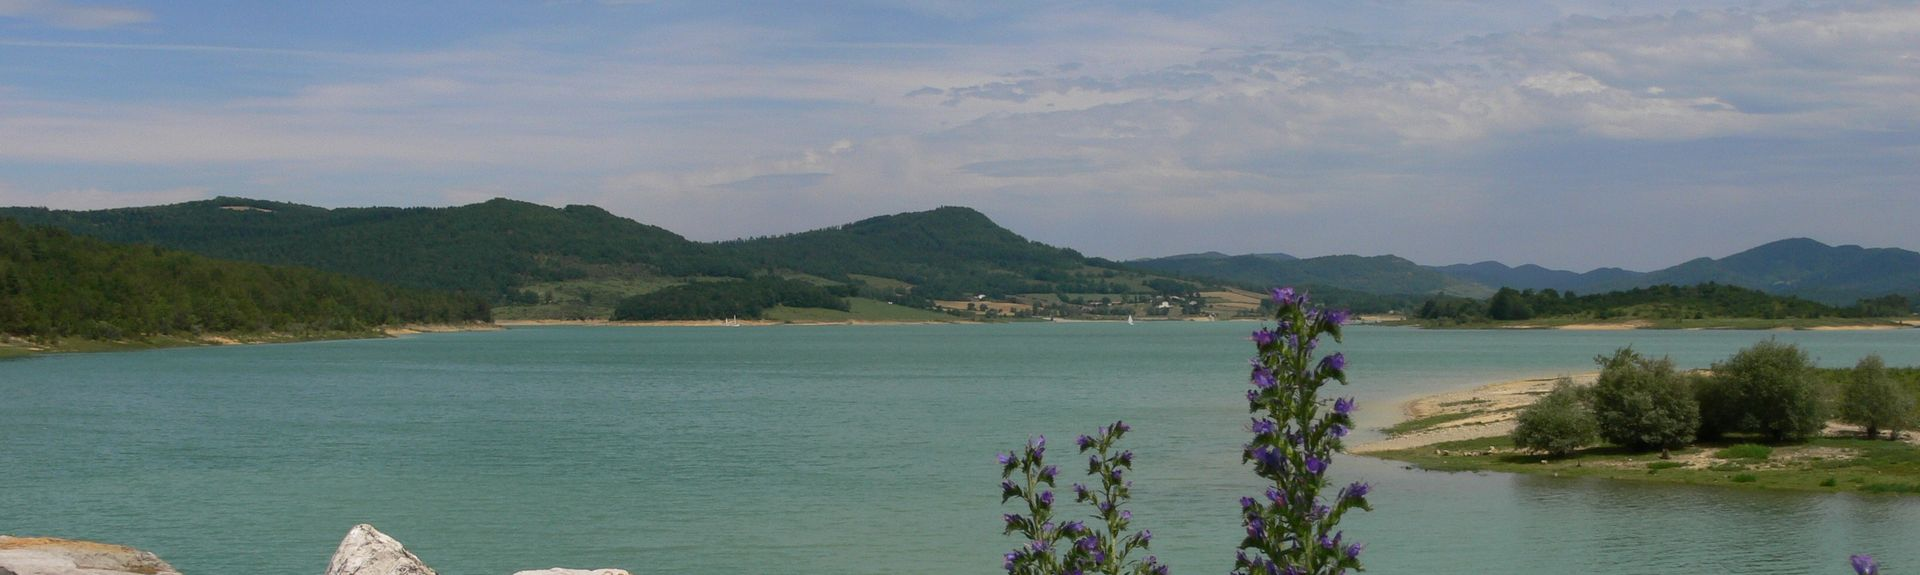 Brassac, Ariege, France